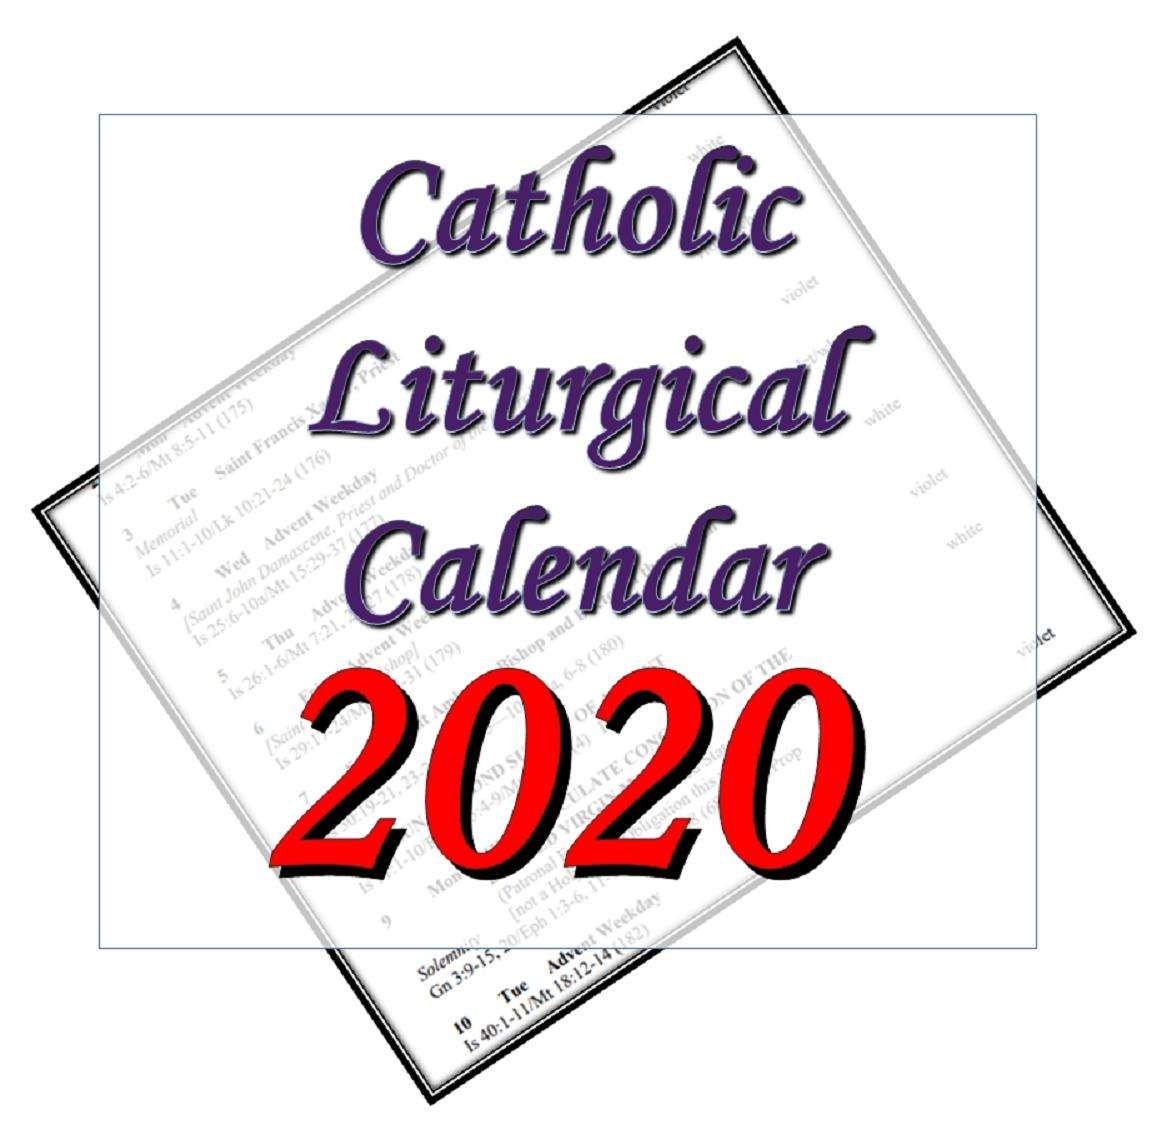 Liturgytools: Catholic Liturgical Calendars For 2020 for Catholic Liturgical Calendar 2019 2020